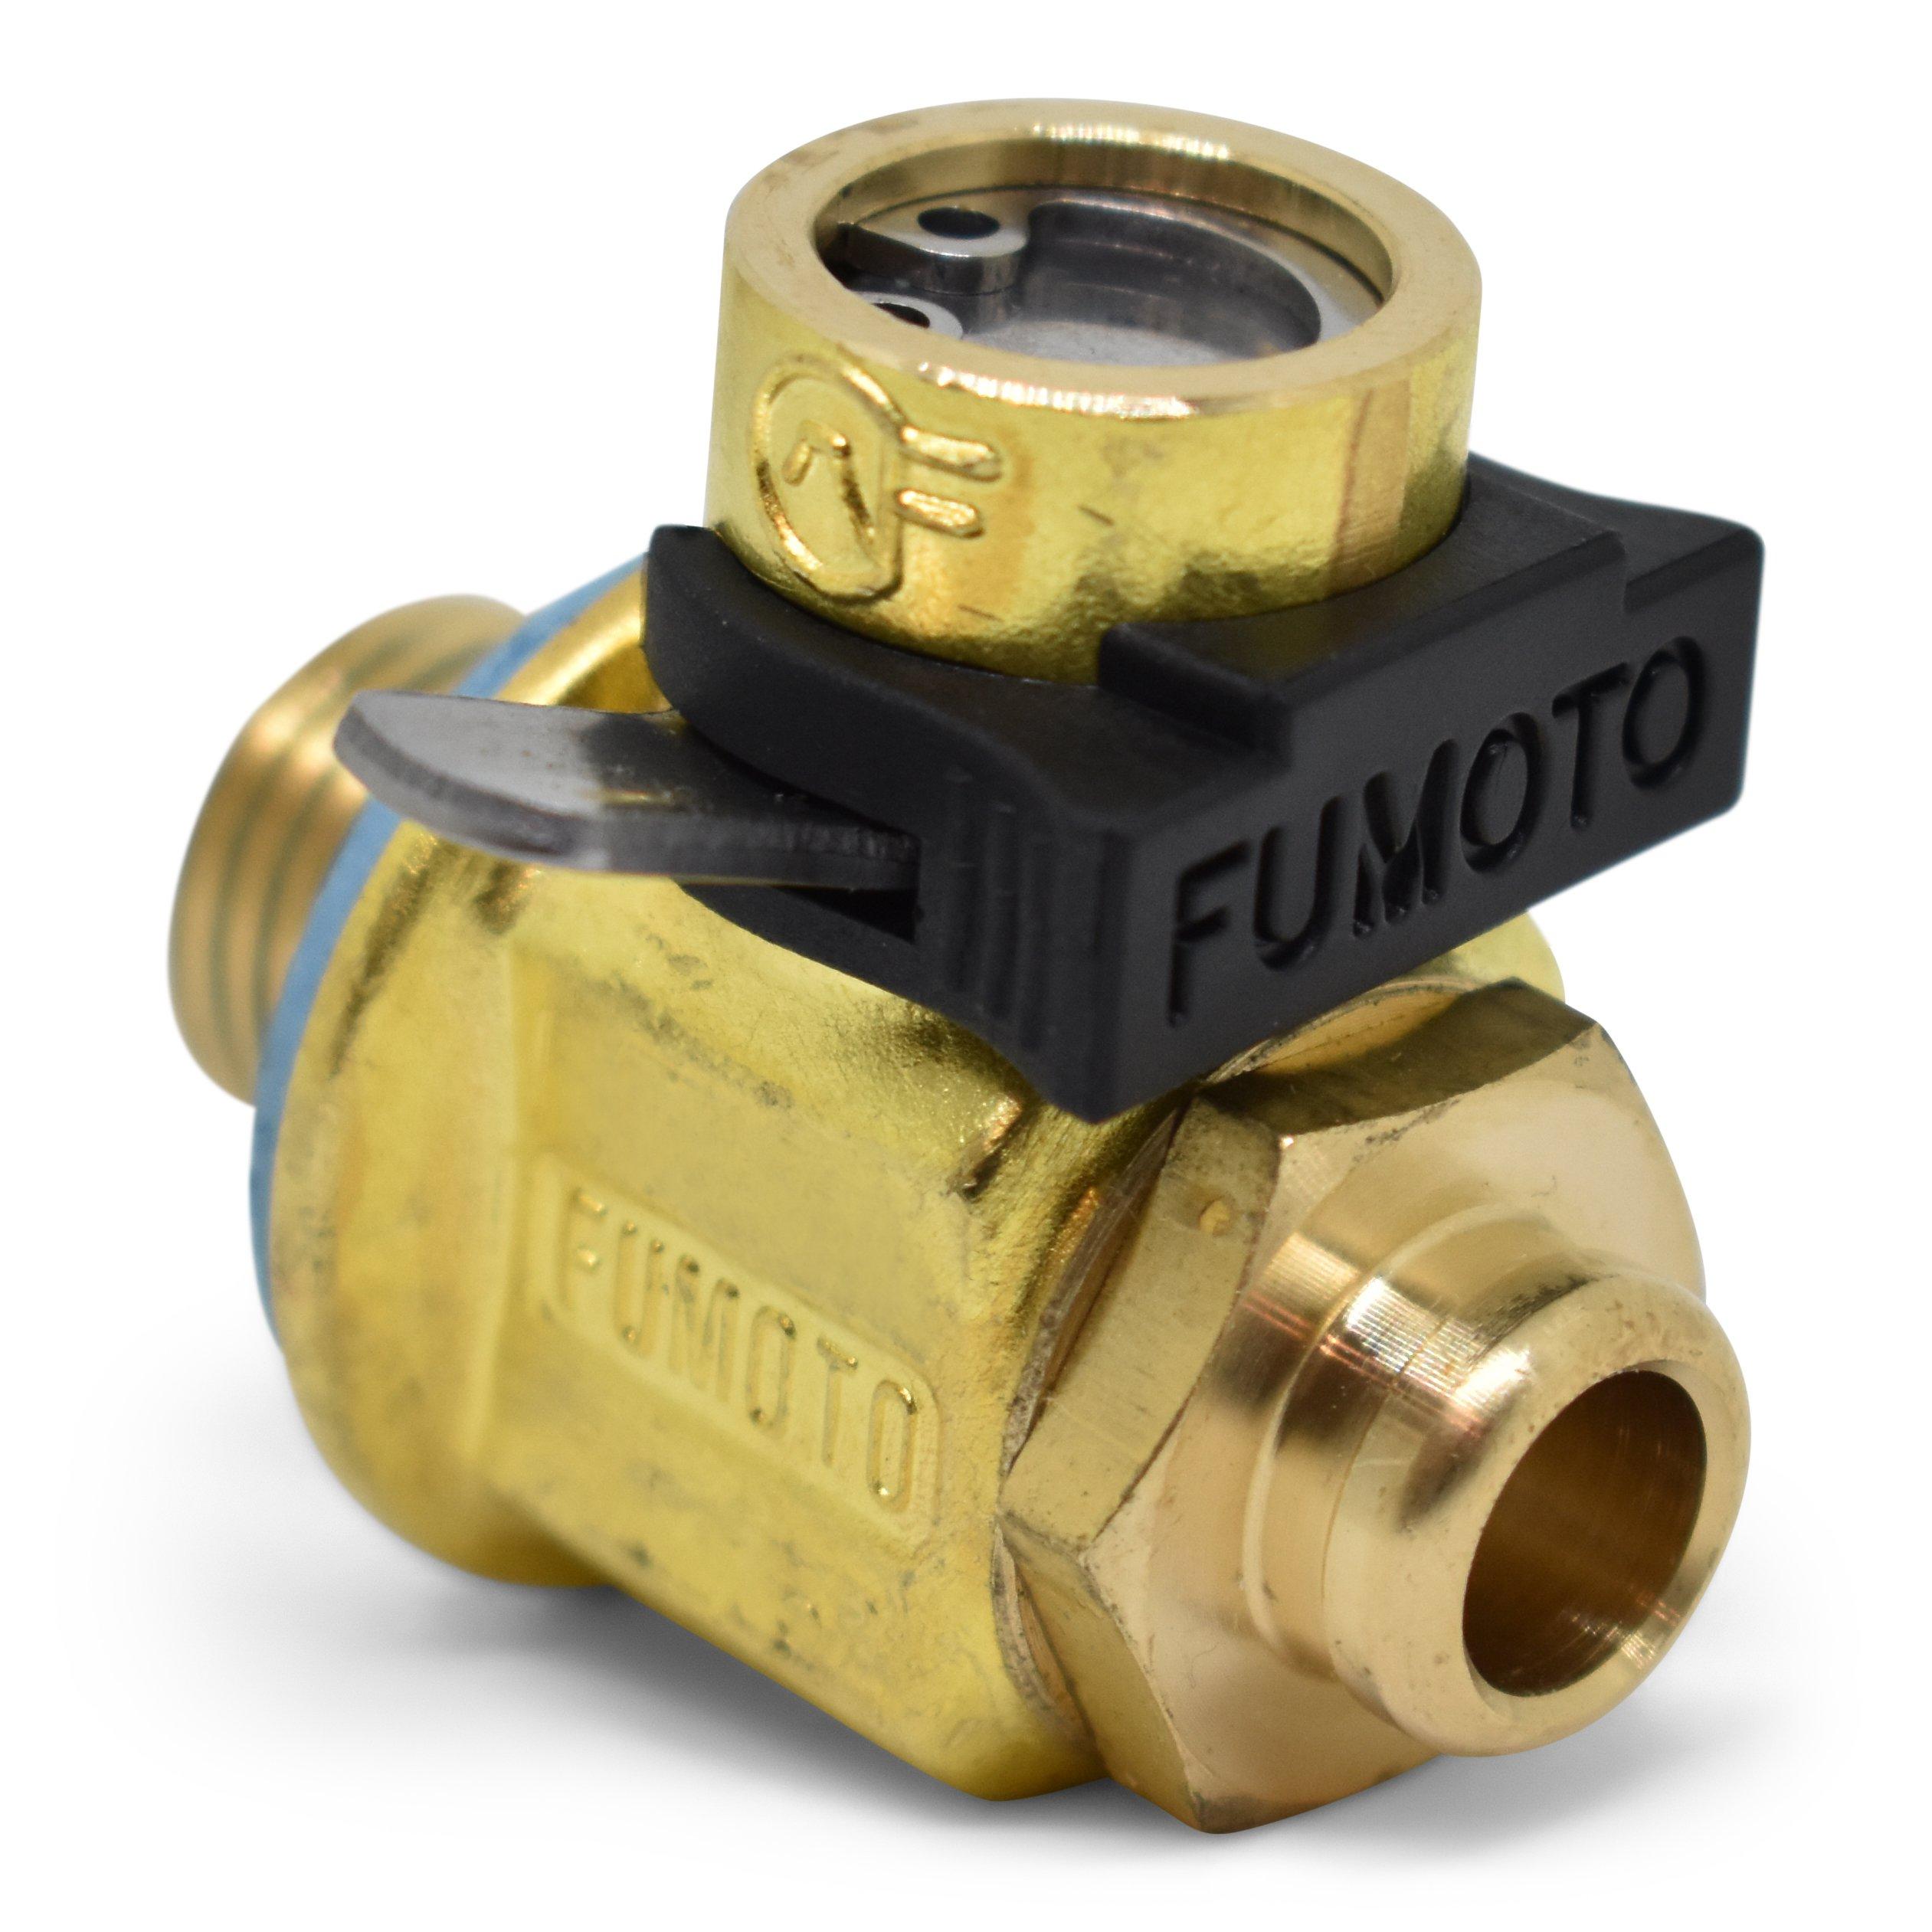 Fumoto F103S LC-10 Lever Clip FS-Series Engine Oil Drain Valve by Fumoto (Image #3)